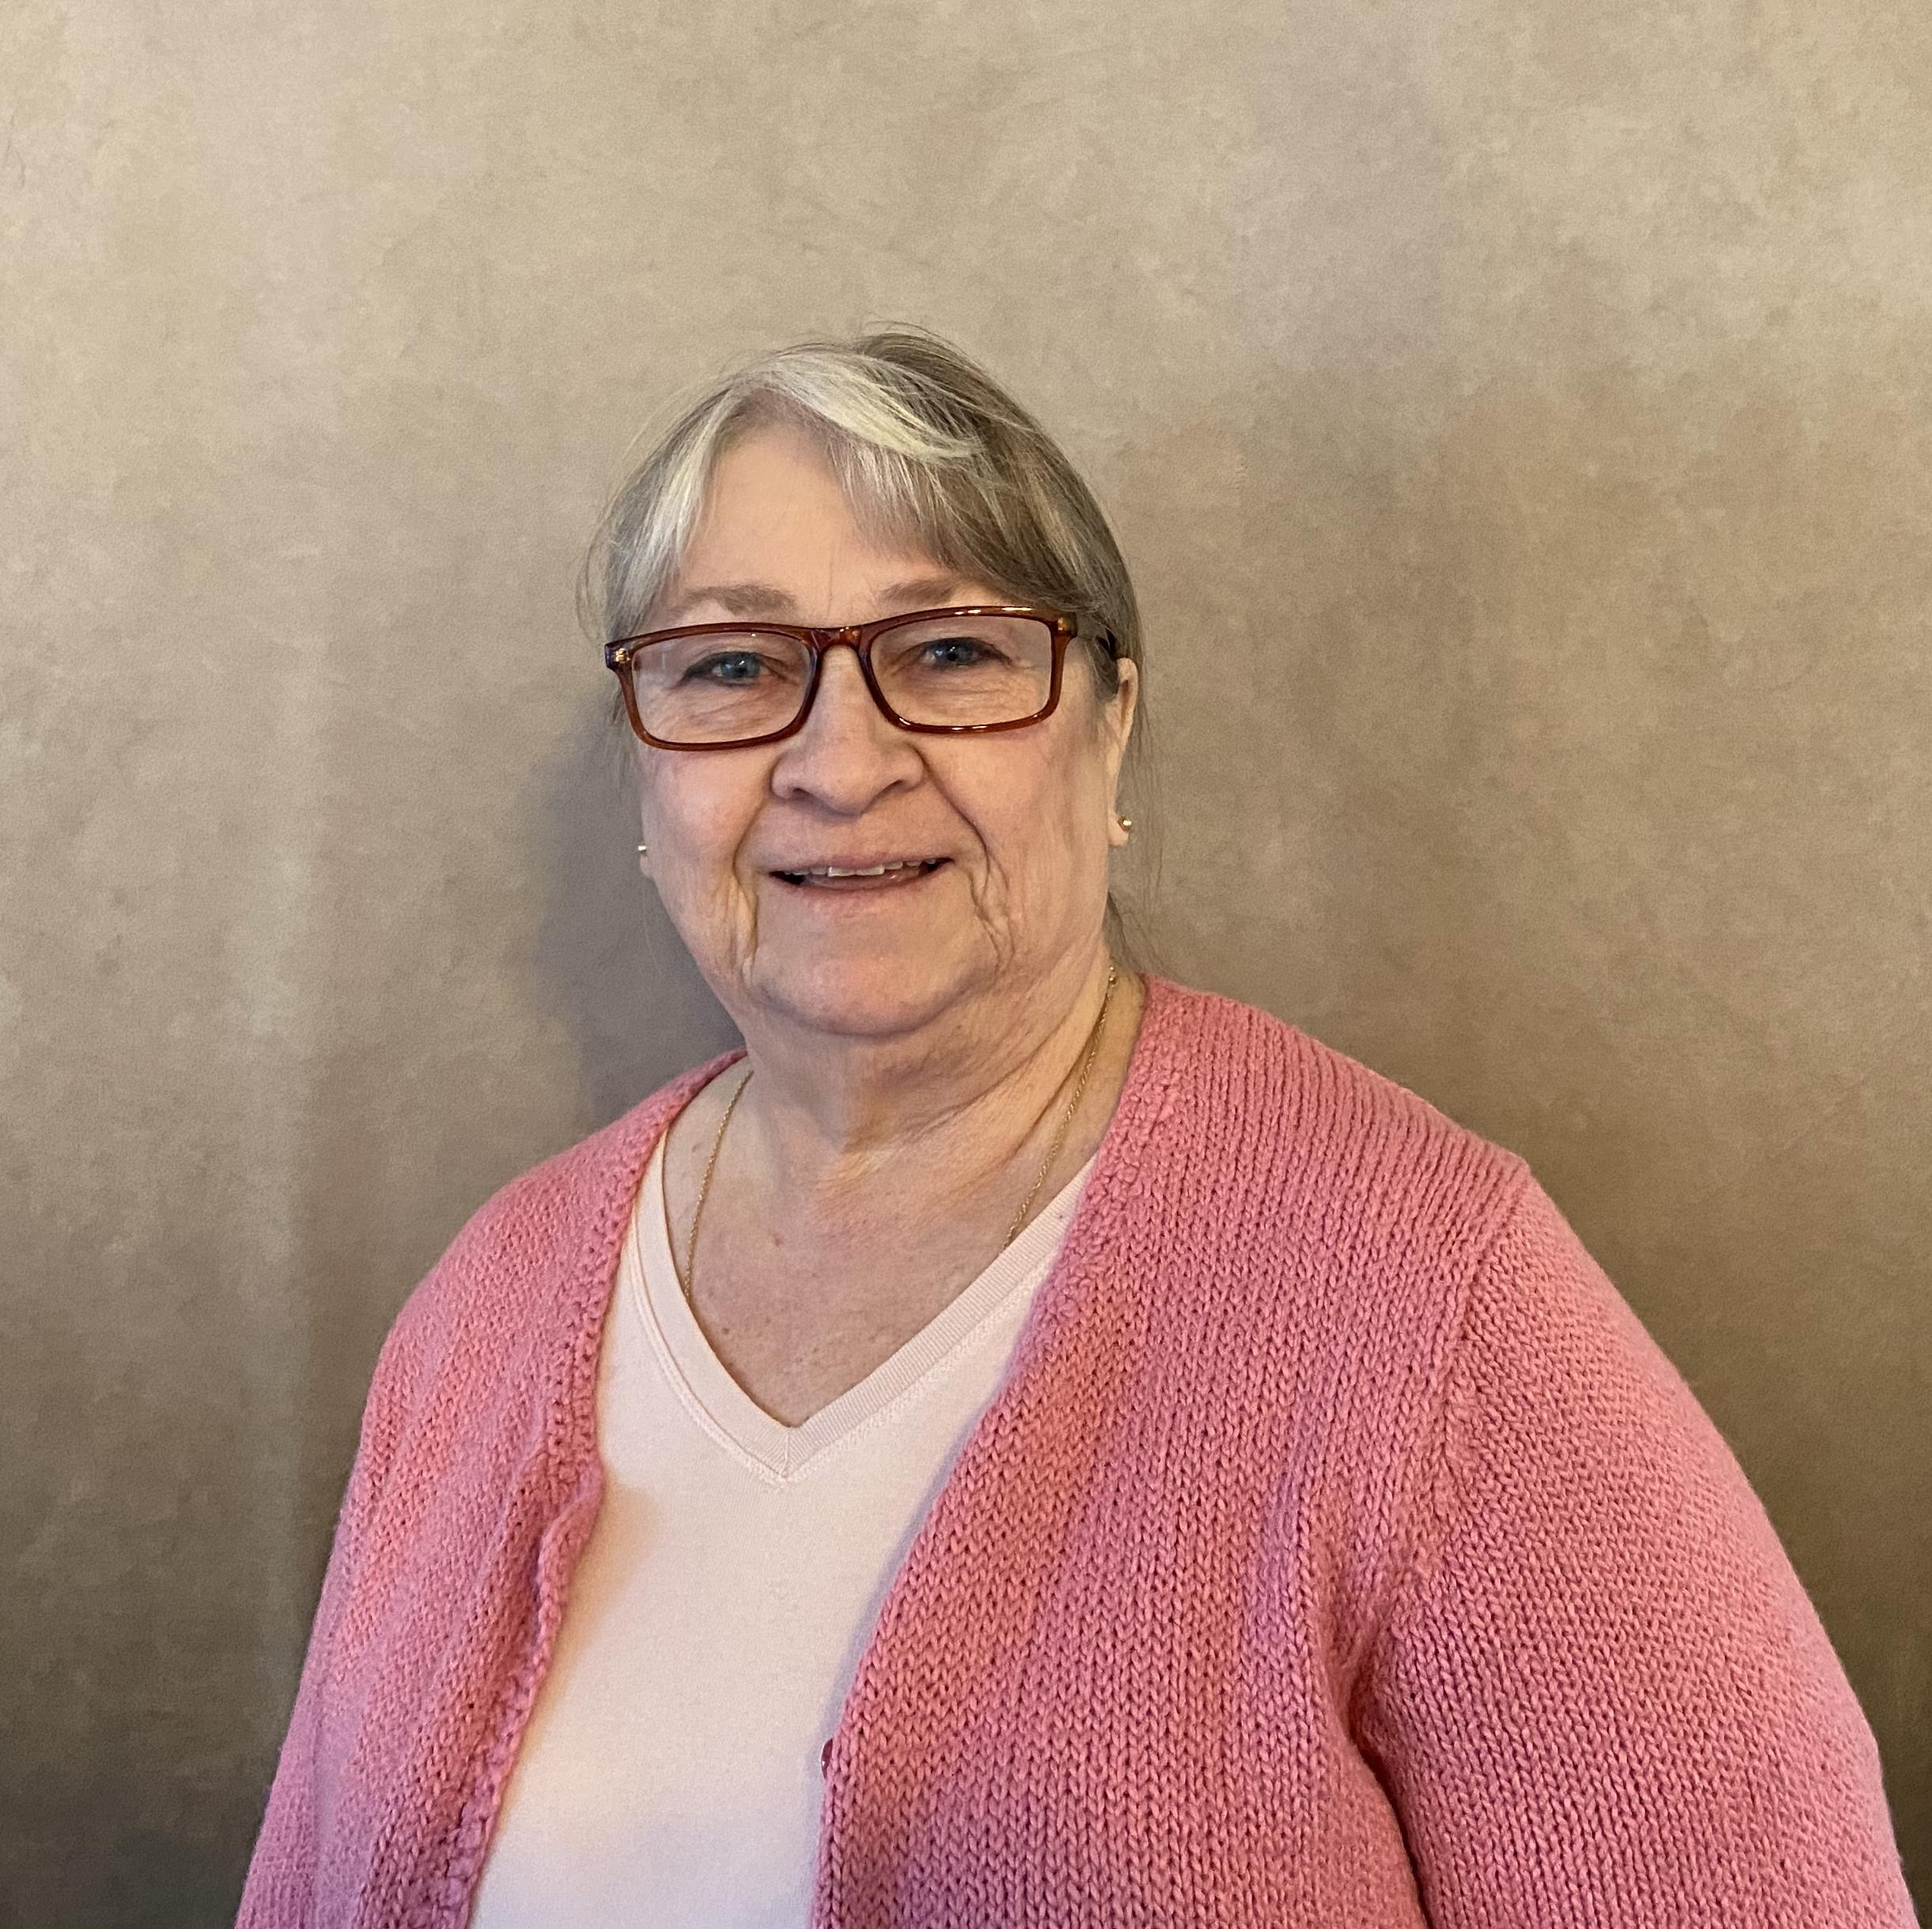 Janice R. Olsen